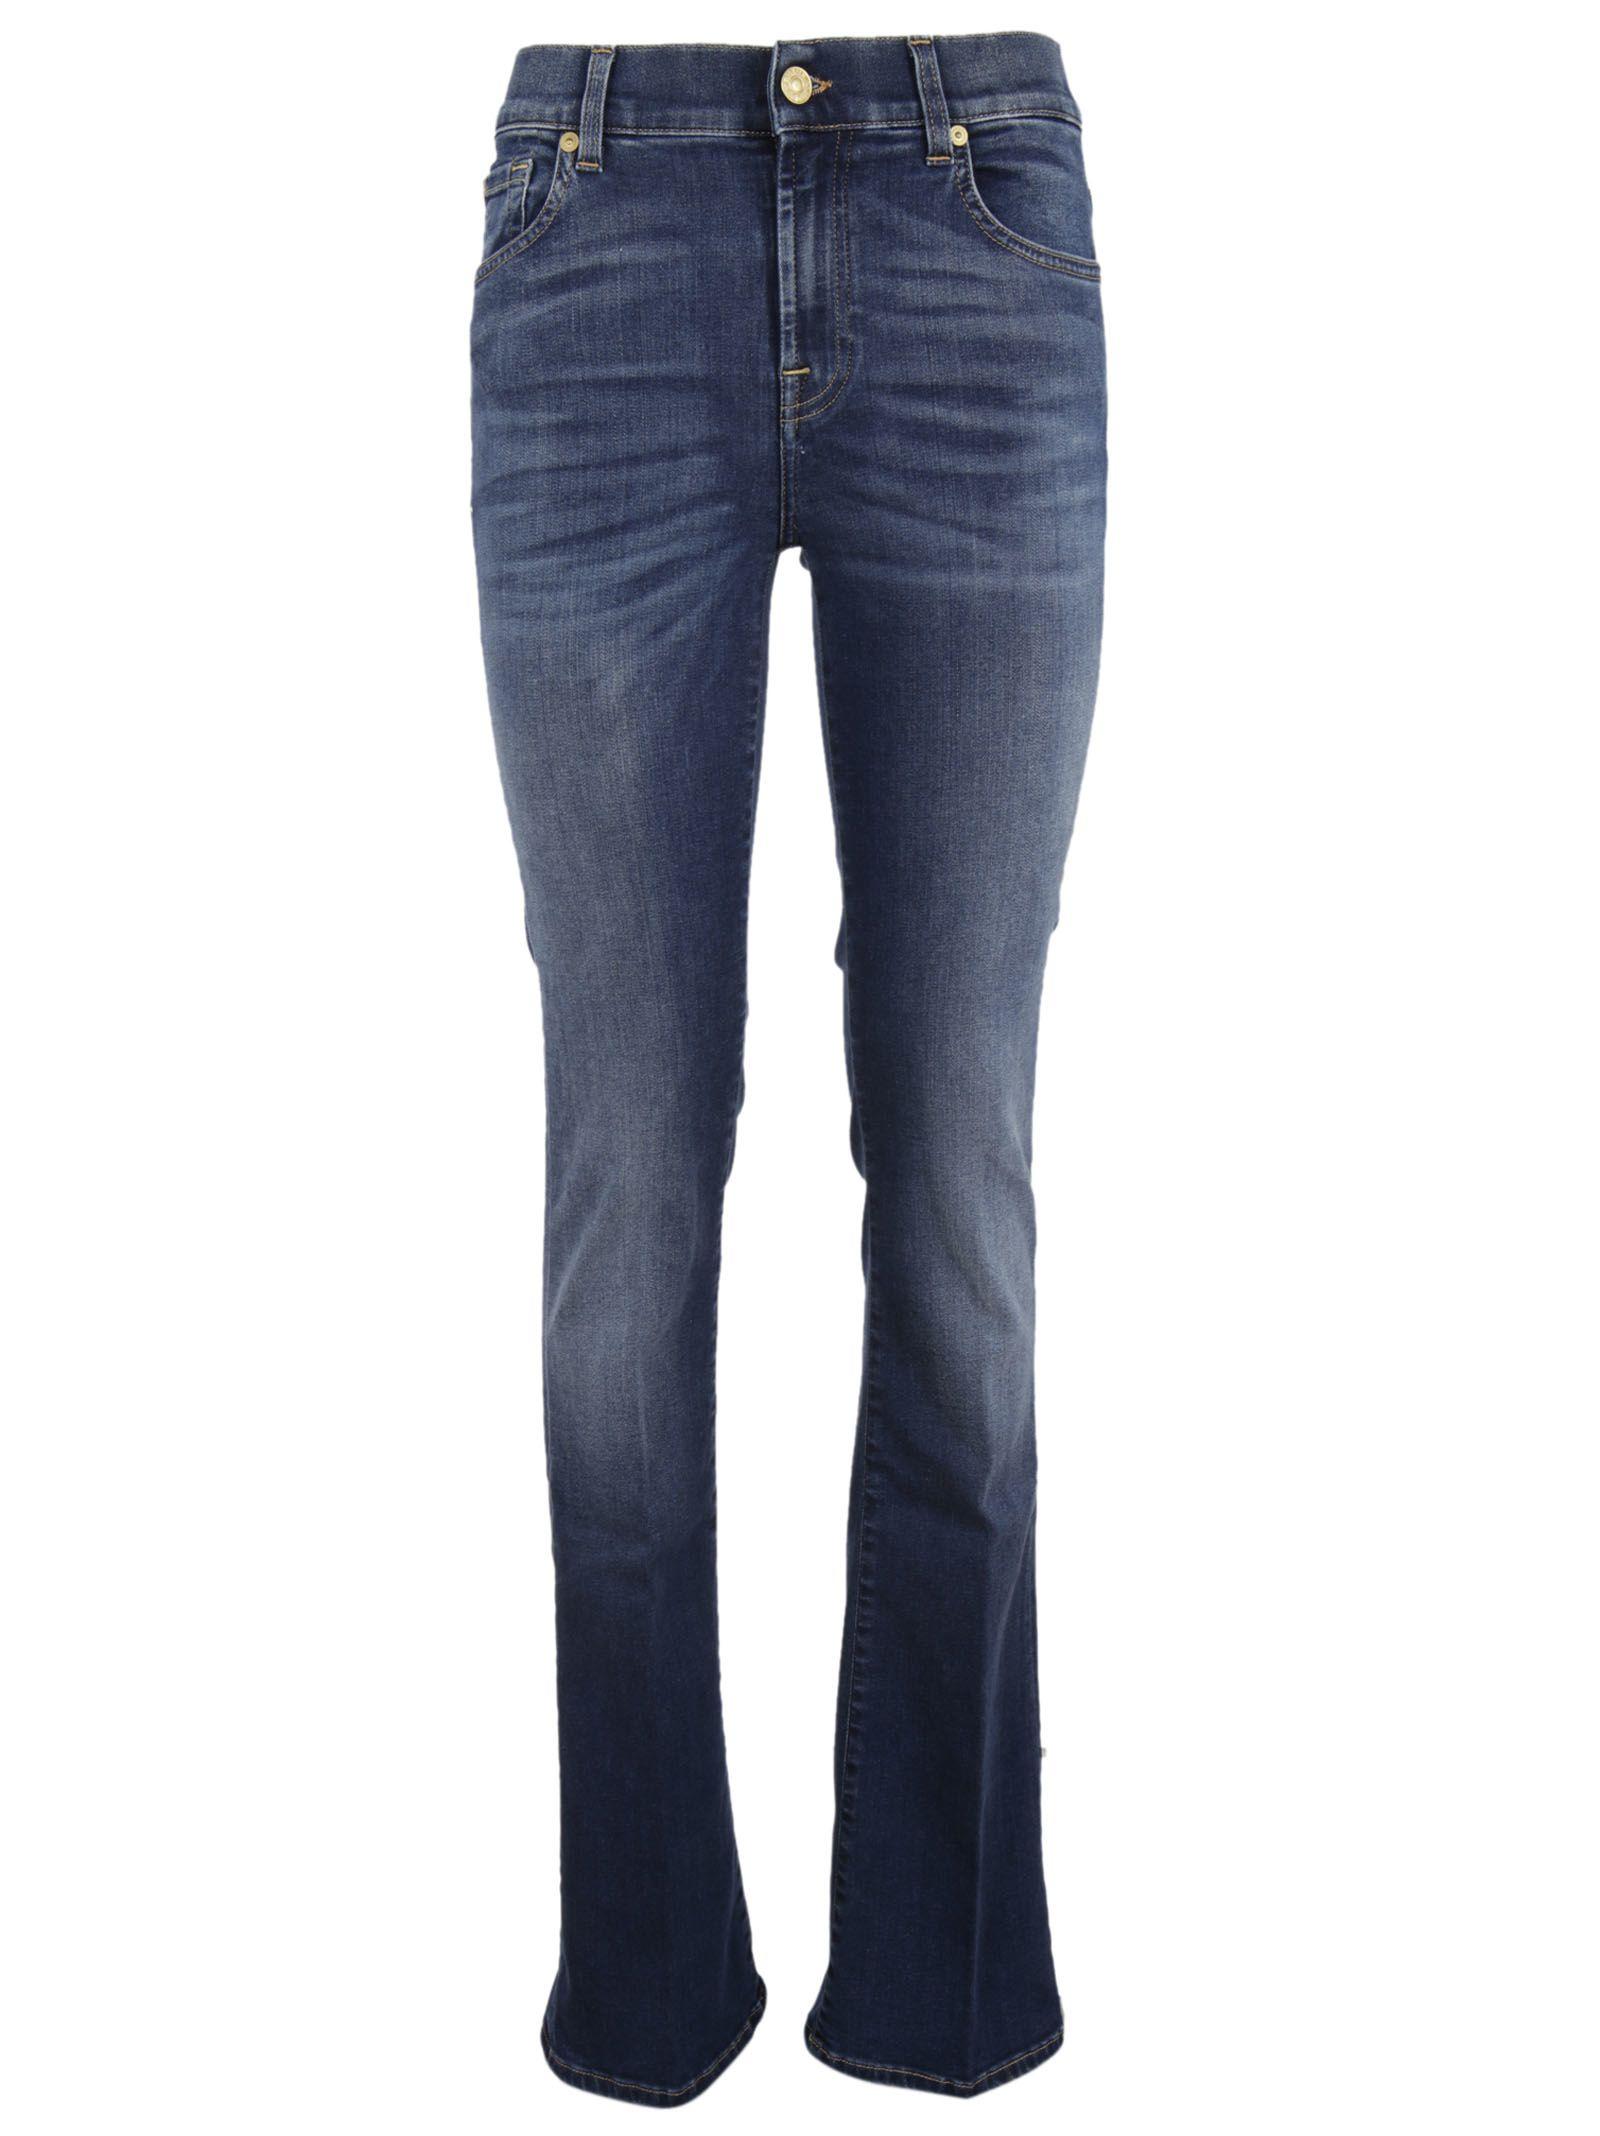 7 for all mankind 7 for all mankind 7 for all mankind bootcut jeans blue women 39 s jeans. Black Bedroom Furniture Sets. Home Design Ideas